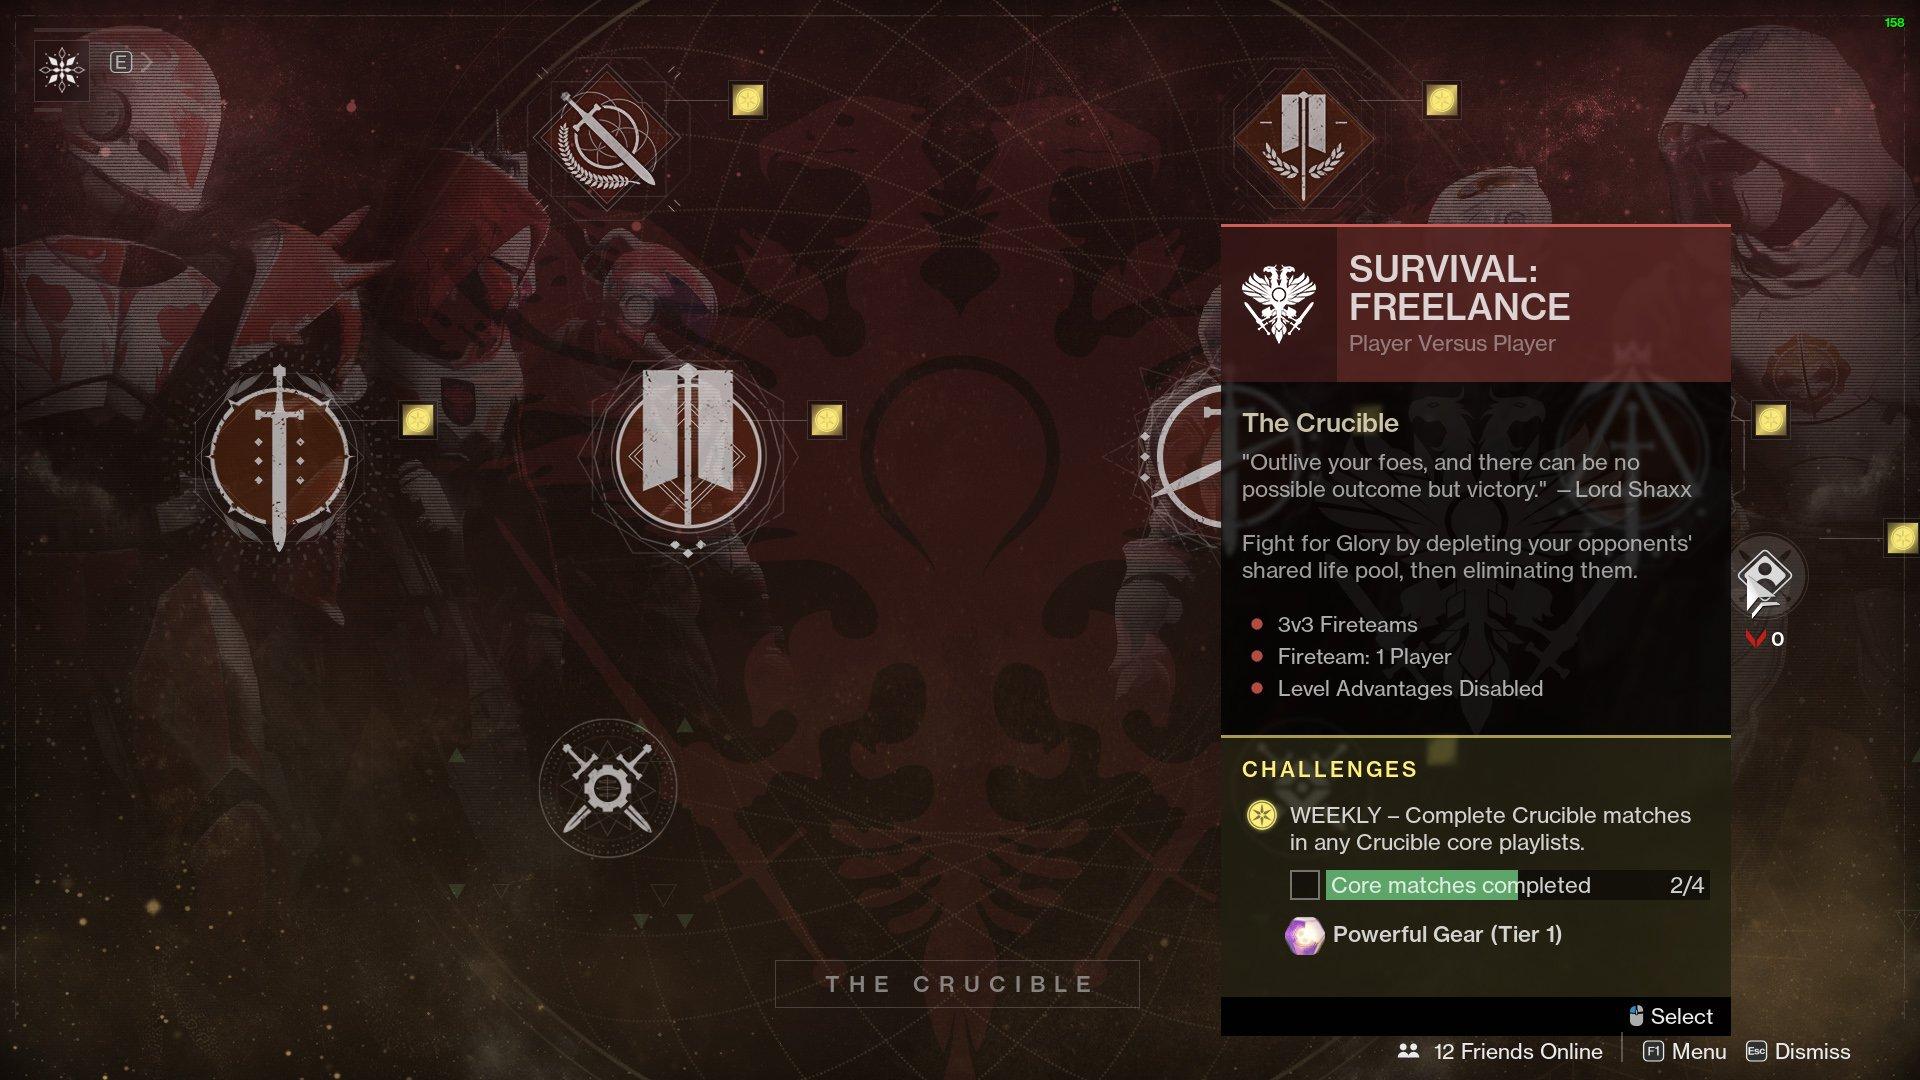 destiny 2 survival freelance